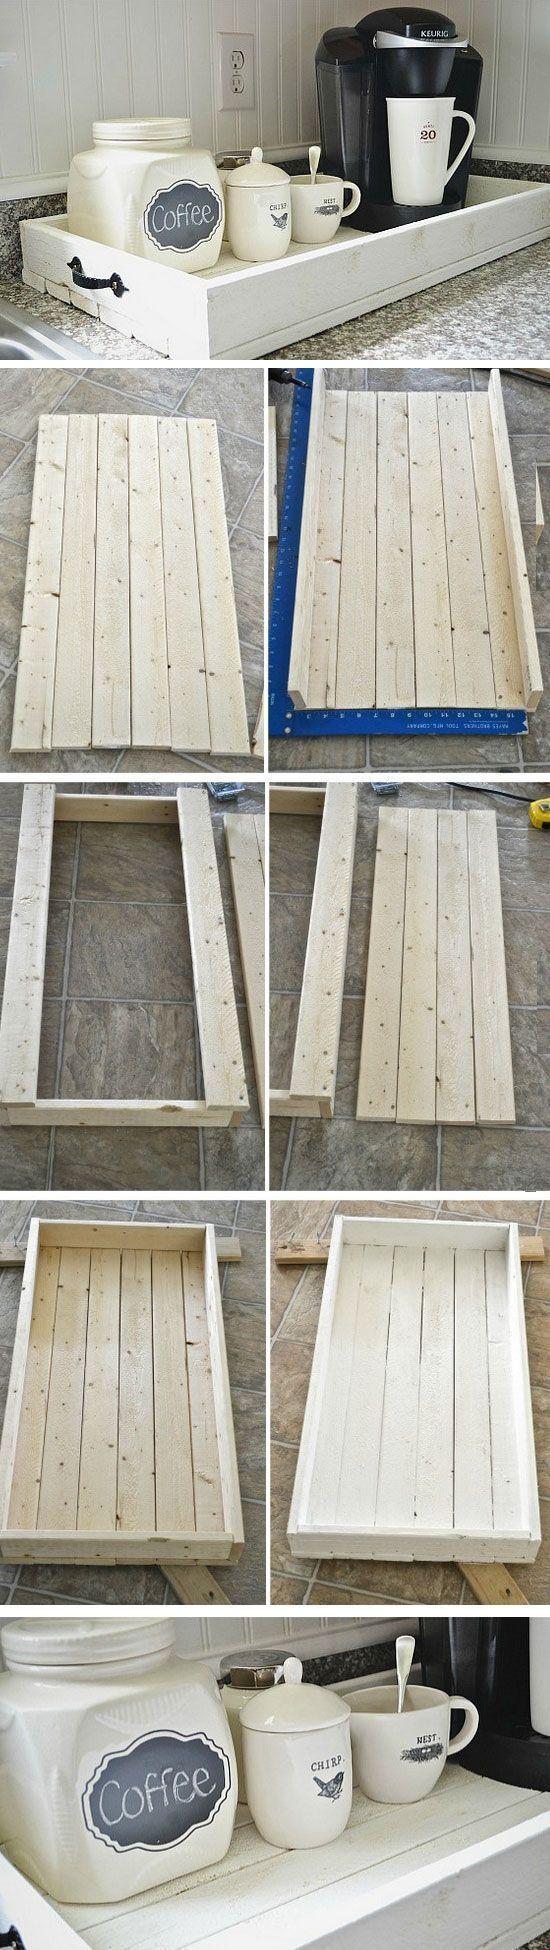 #woodworkingplans #woodworking #woodworkingprojects cool 23 DIY Kitchen Organization Ideas